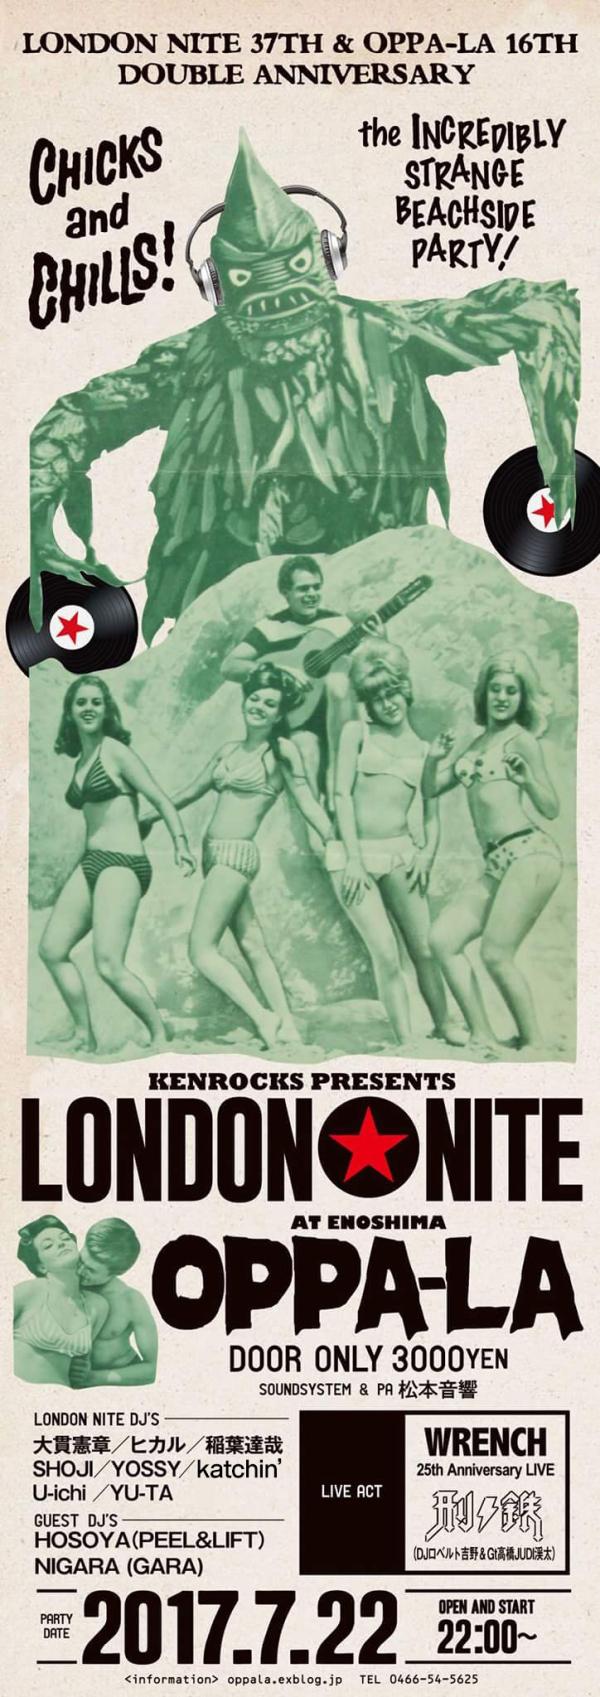 Londonnite